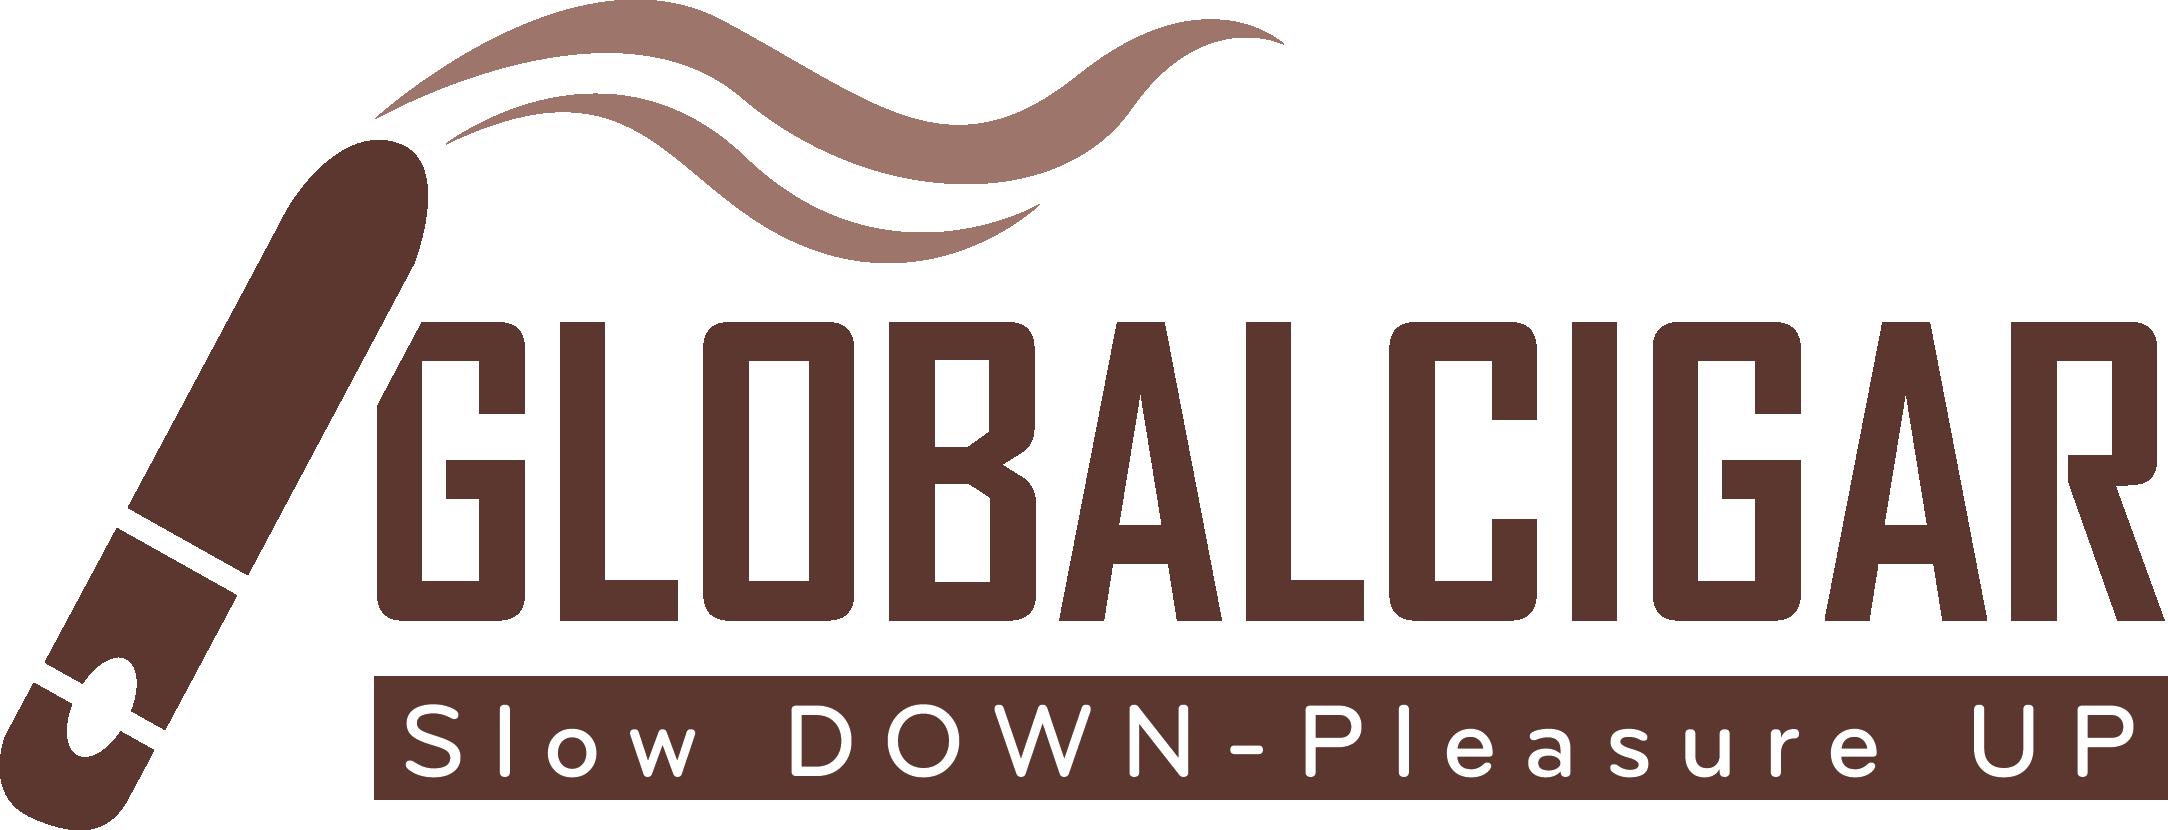 Global Cigar